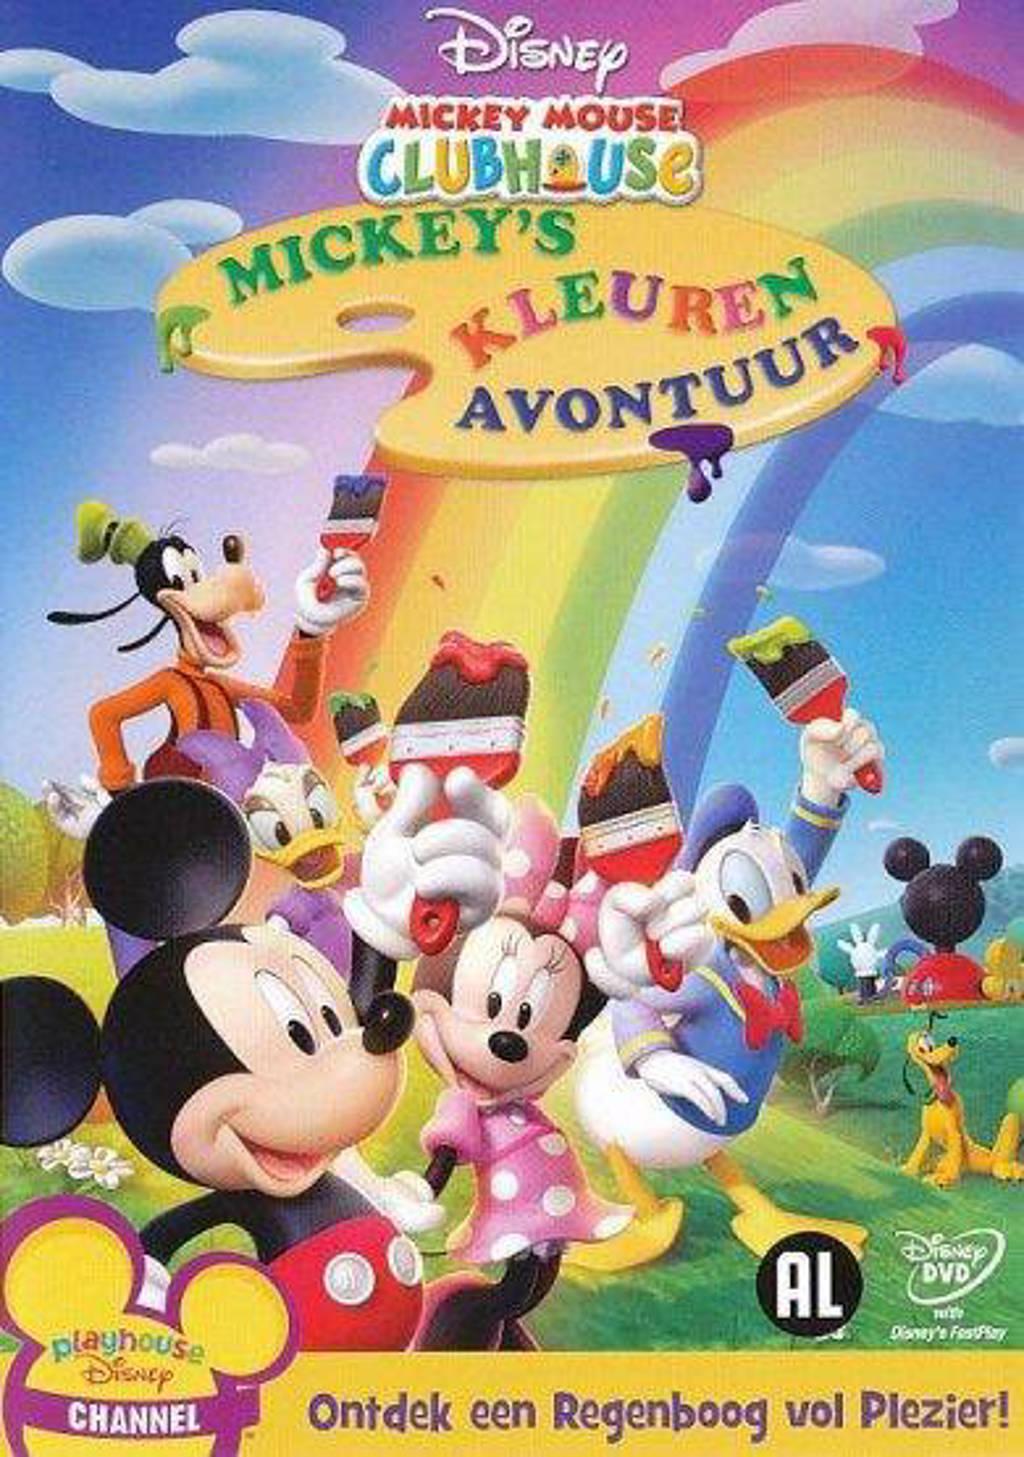 Mickey Mouse Clubhouse - Mickey's Kleuren Avontuur (DVD)